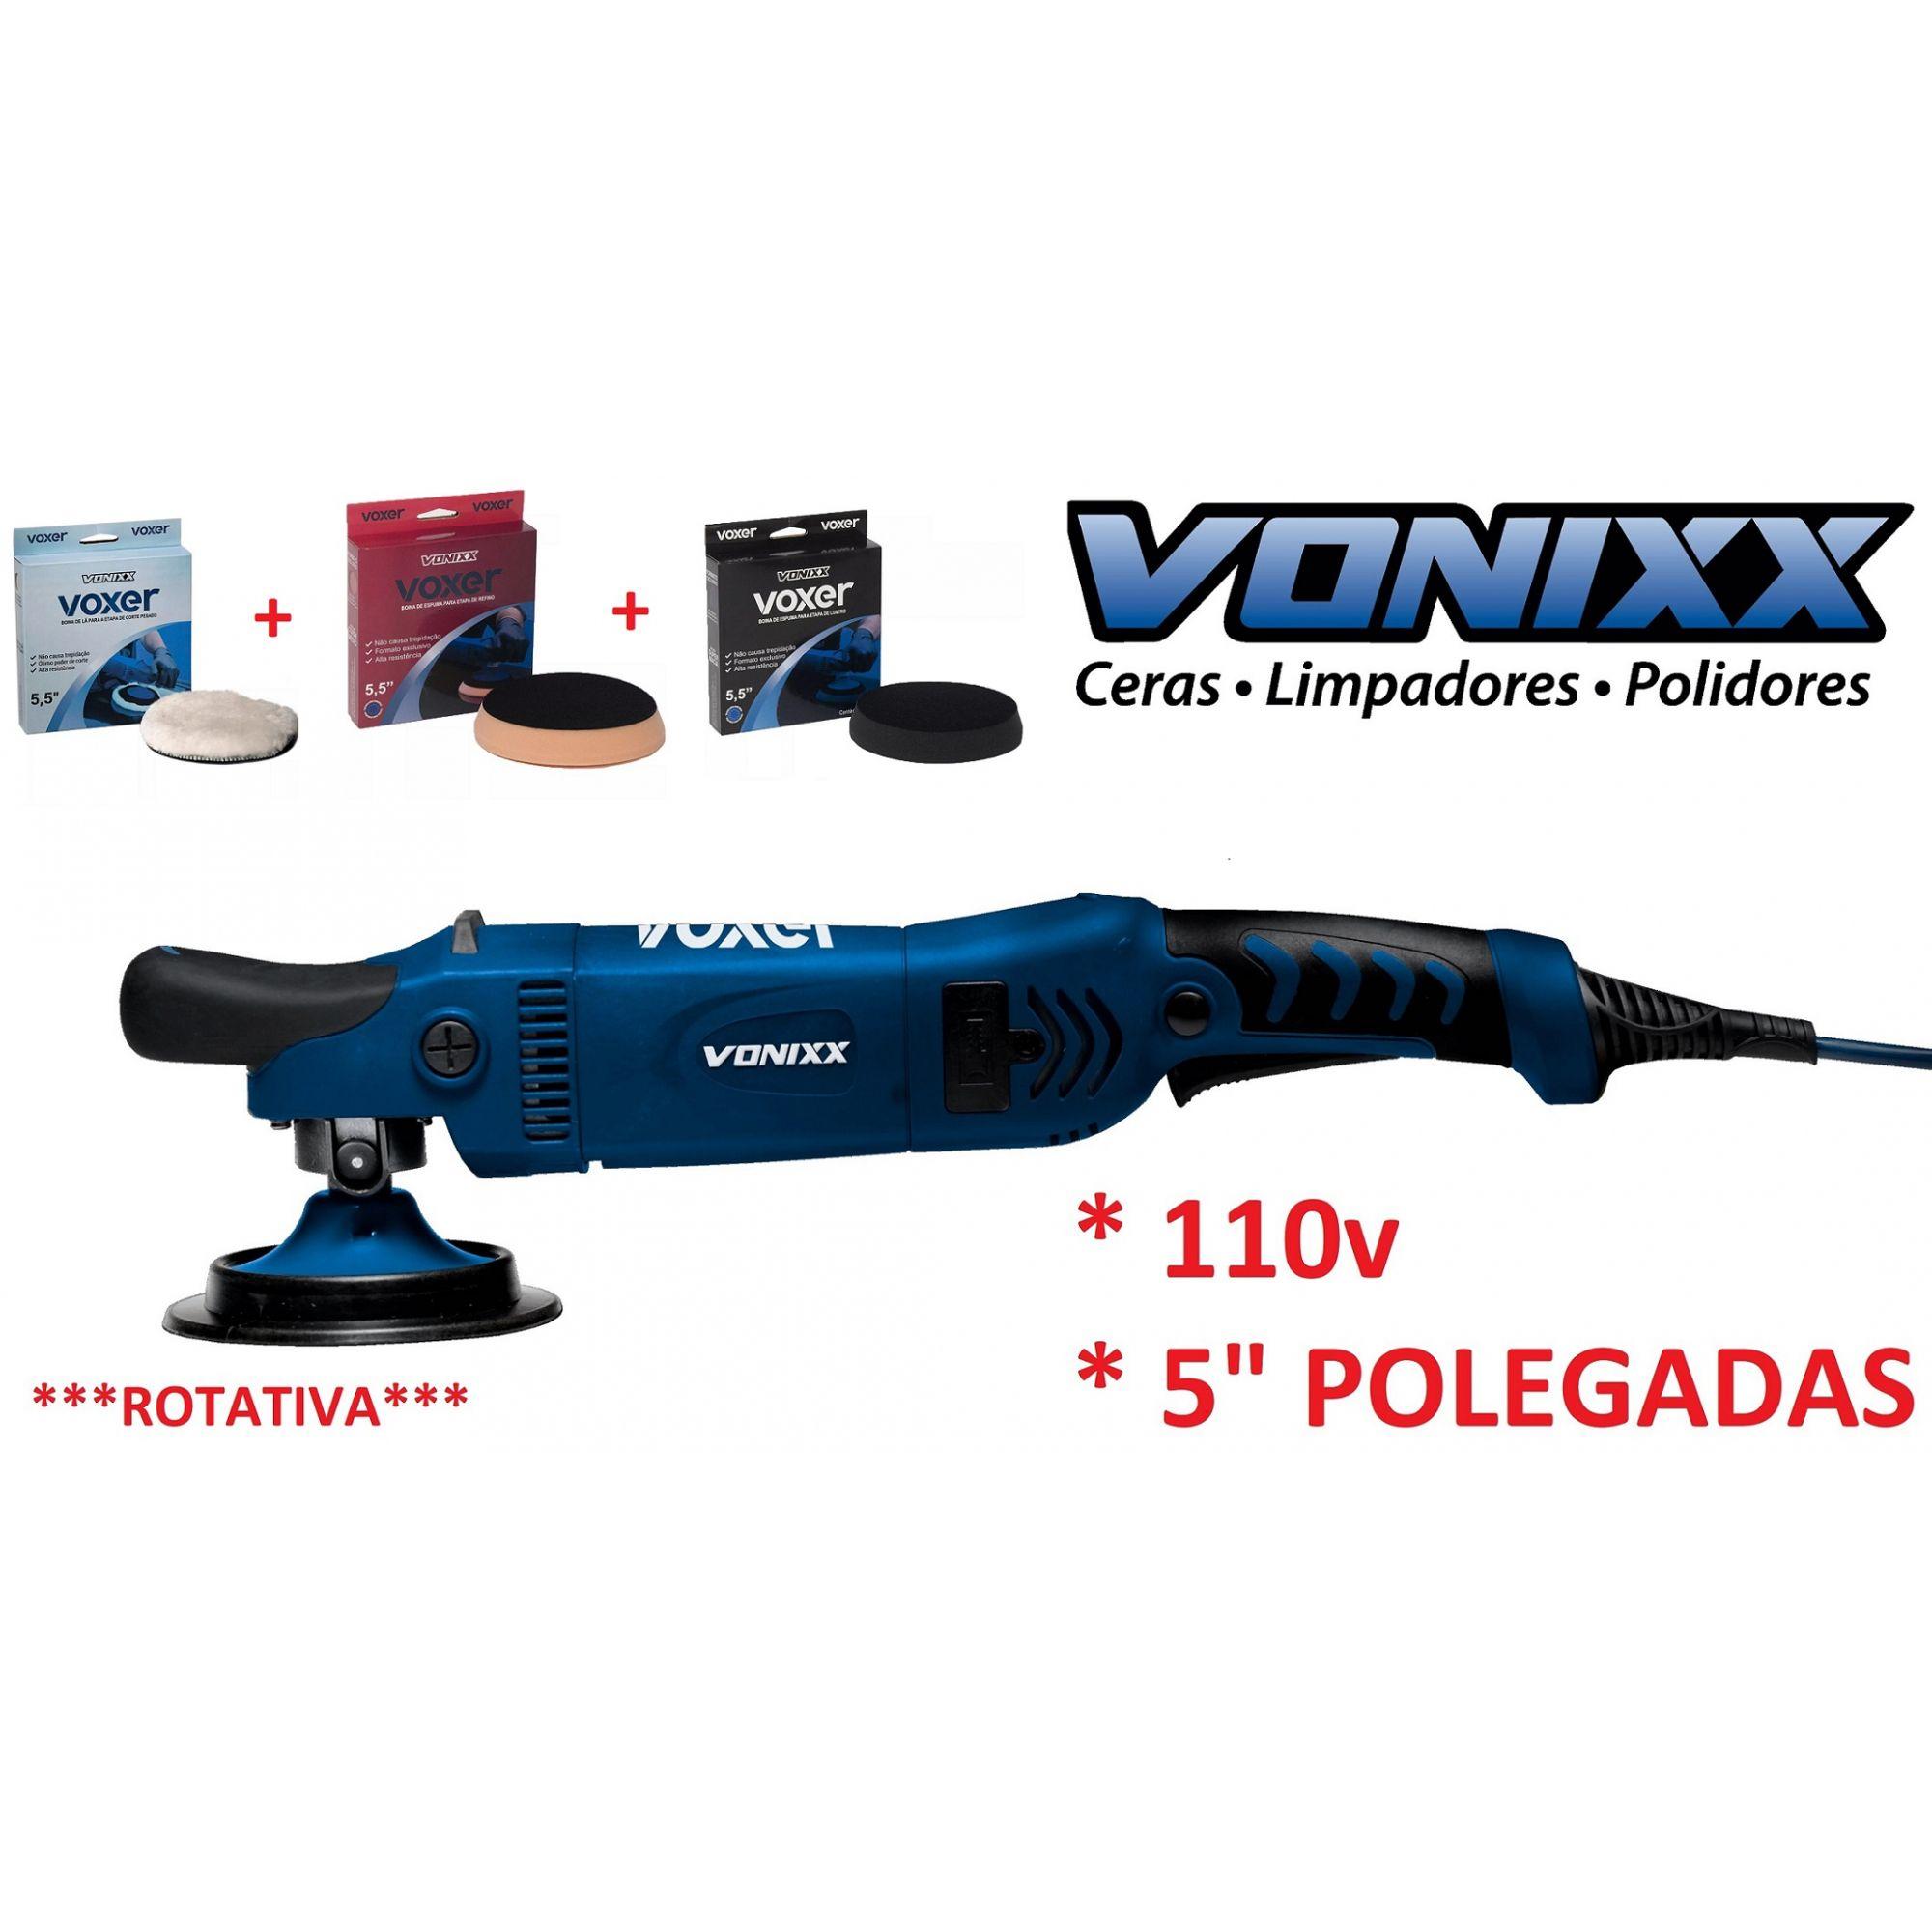 "Politriz Rotativa D. Red. 150mm 5"" 110v Voxer Vonixx + Kit boinas corte refino lustro"